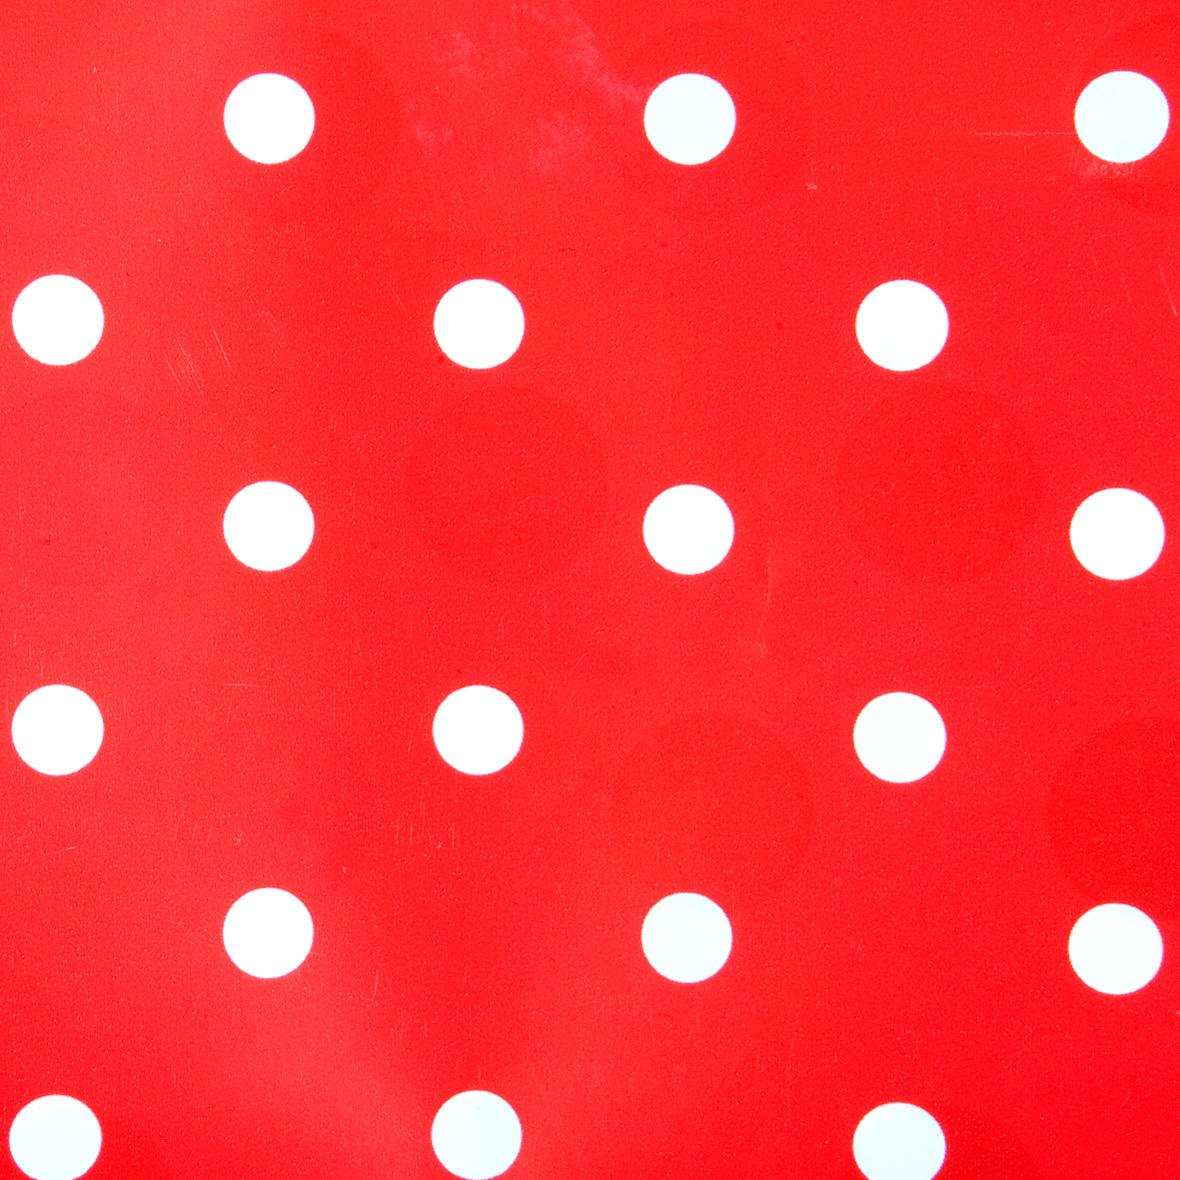 Plakplastic zelfklevende folie - Kitsch Kitchen - rood/witte stippen